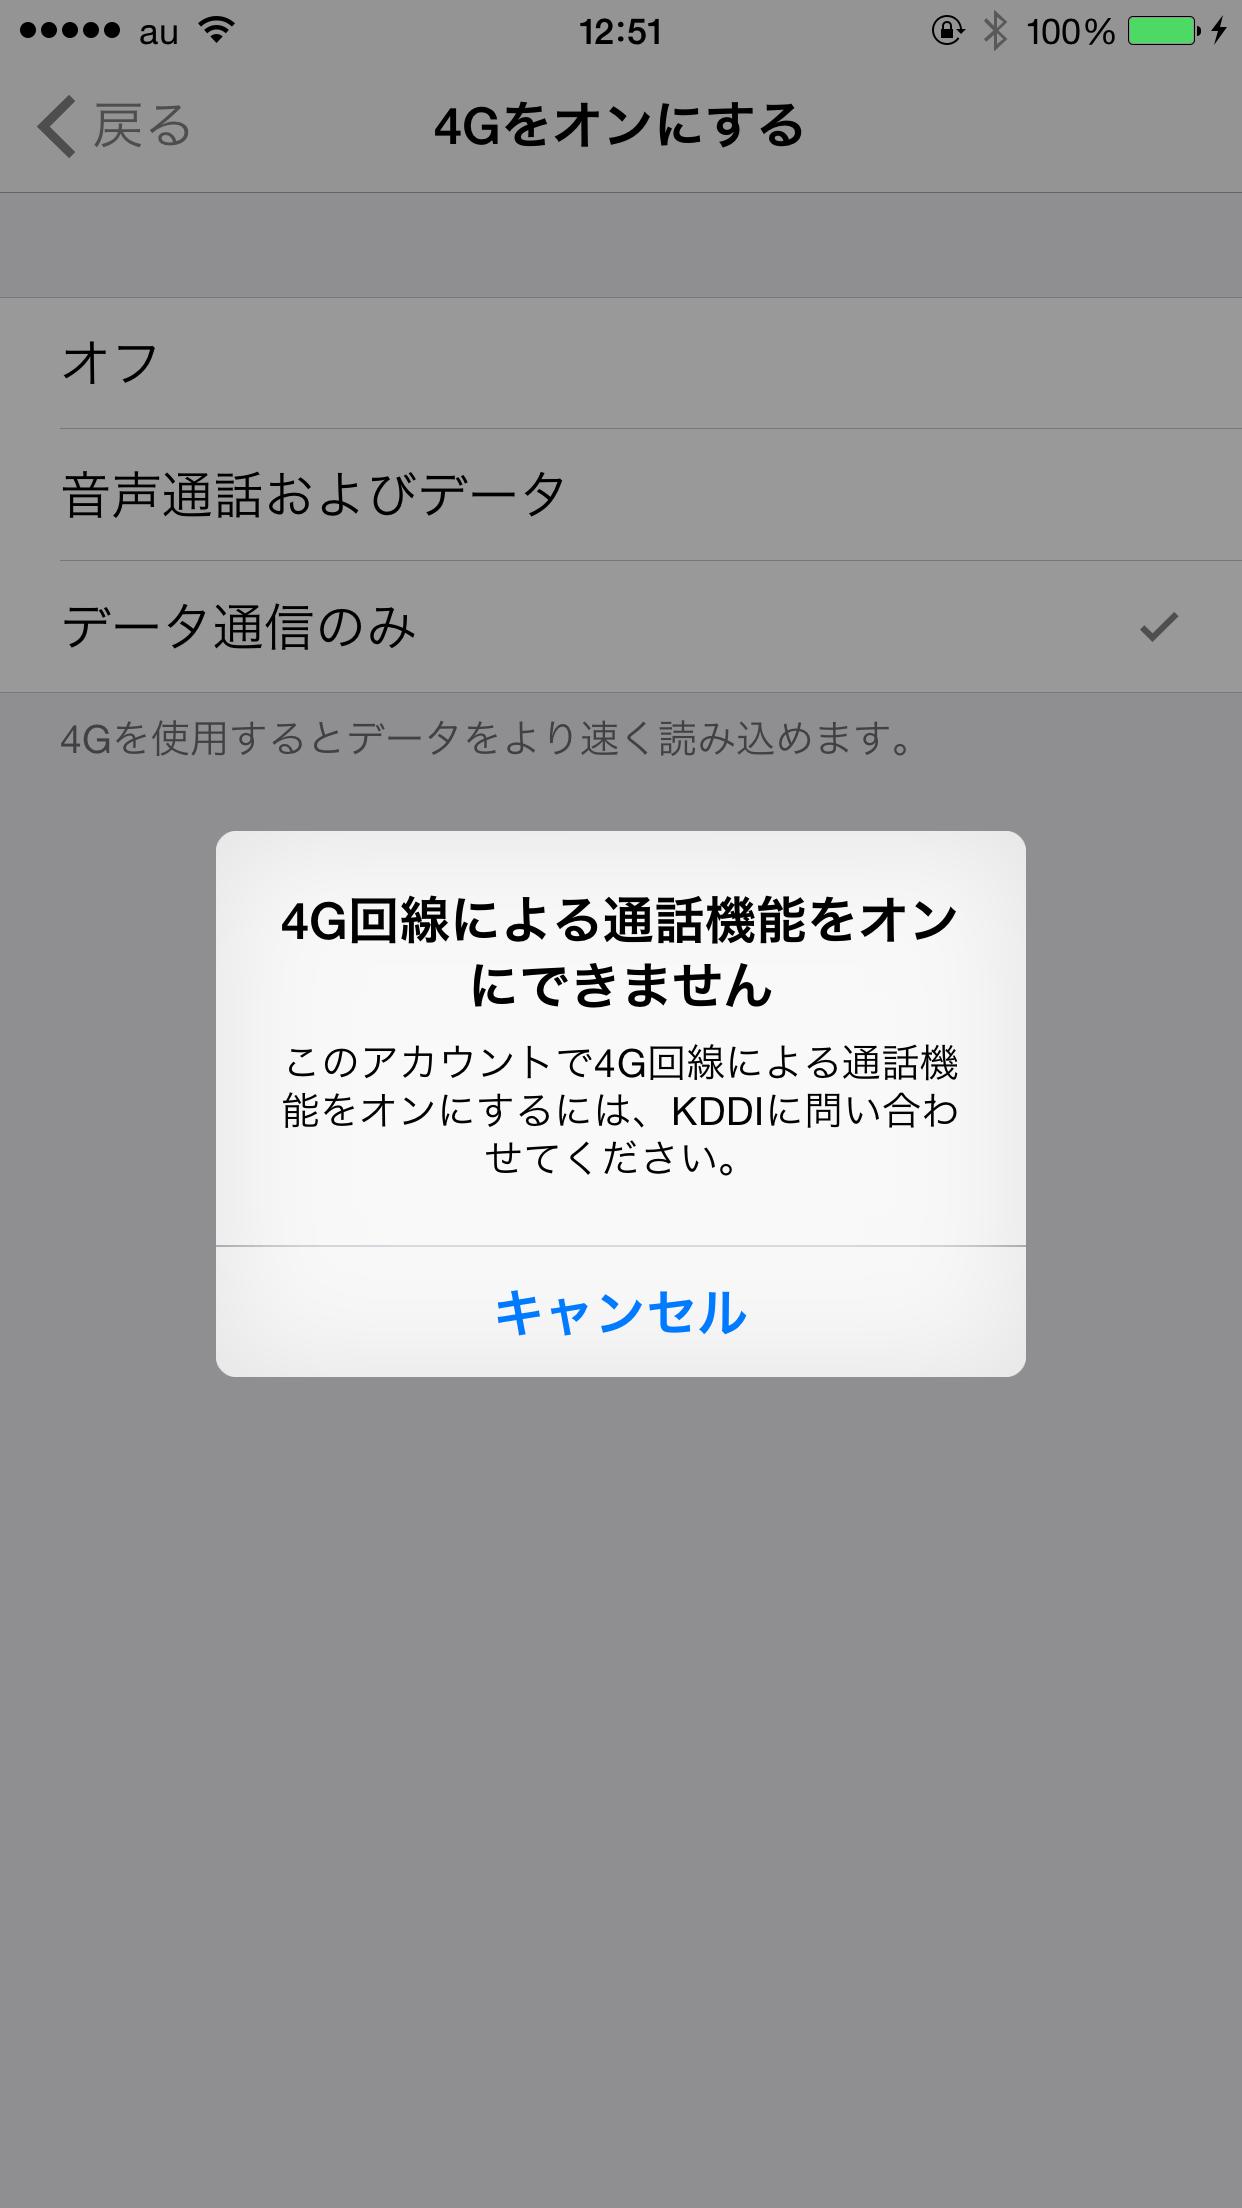 iOS 8.3のSIMフリーiPhone 6/6 PlusでauのVoLTEを利用可能にする方法